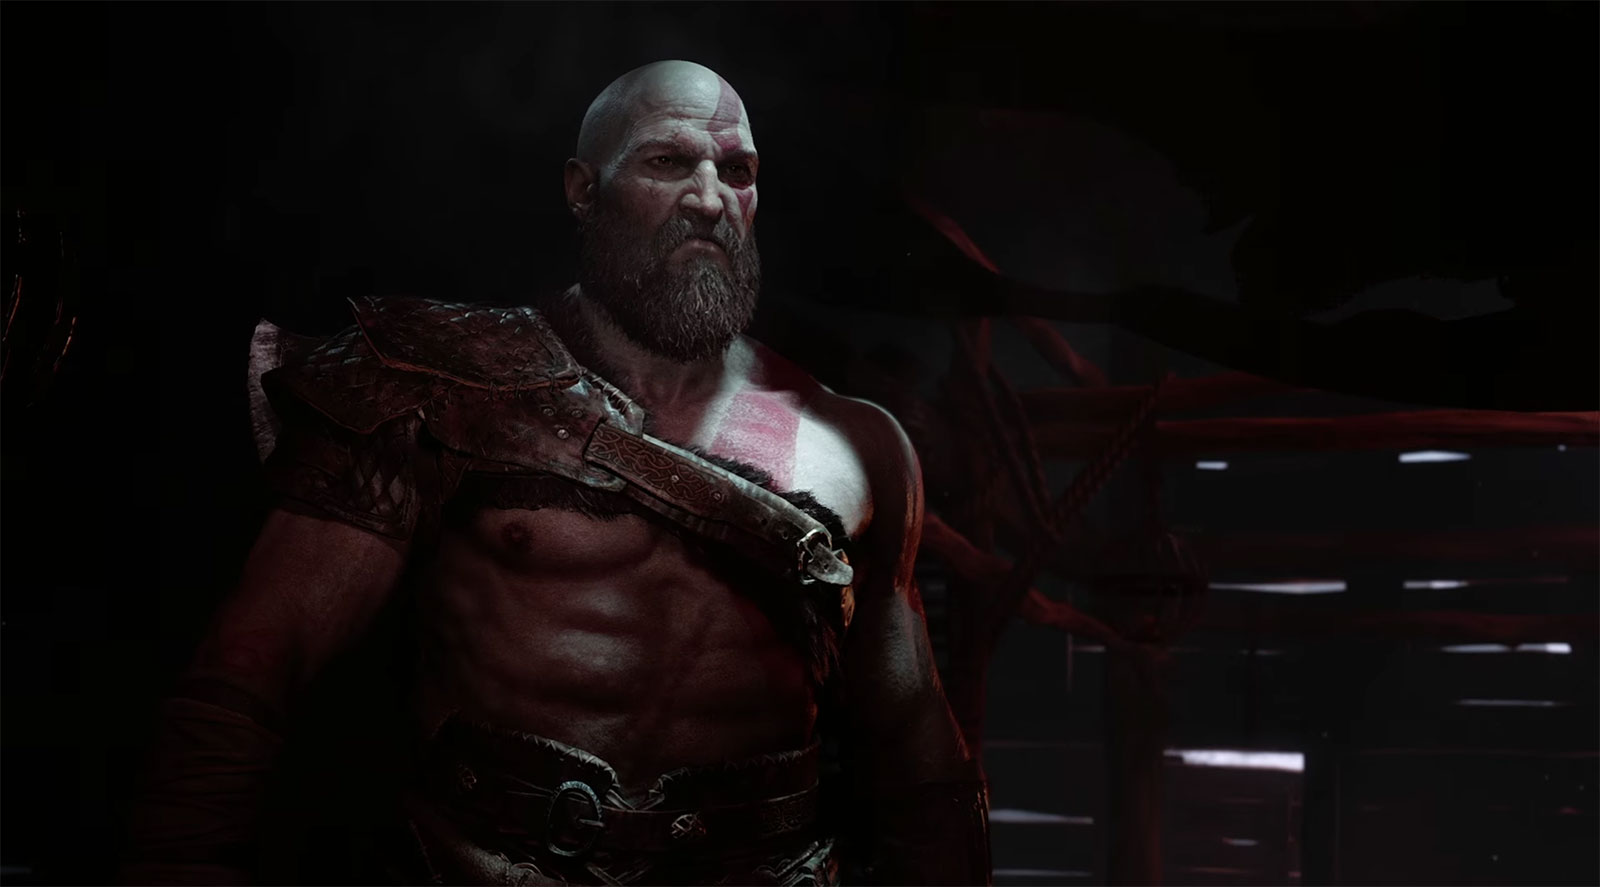 god_of_war_iv_kratos01